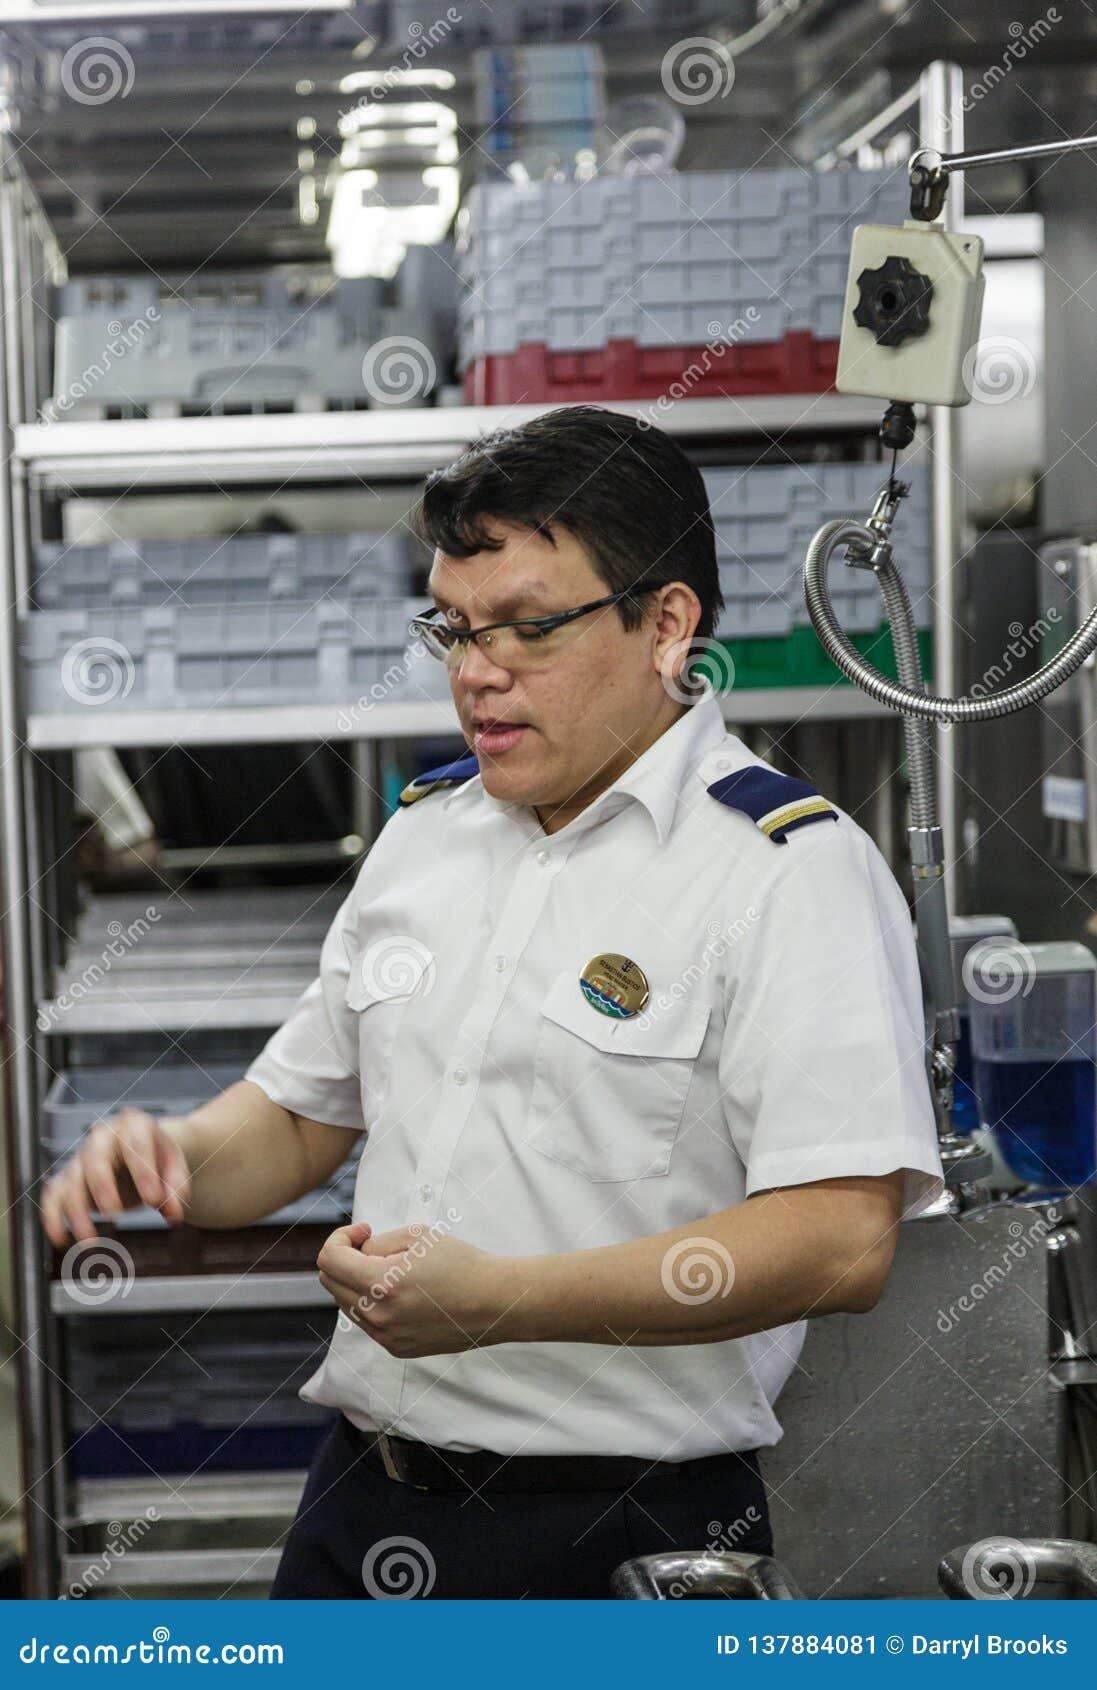 Dishwashing kierownik